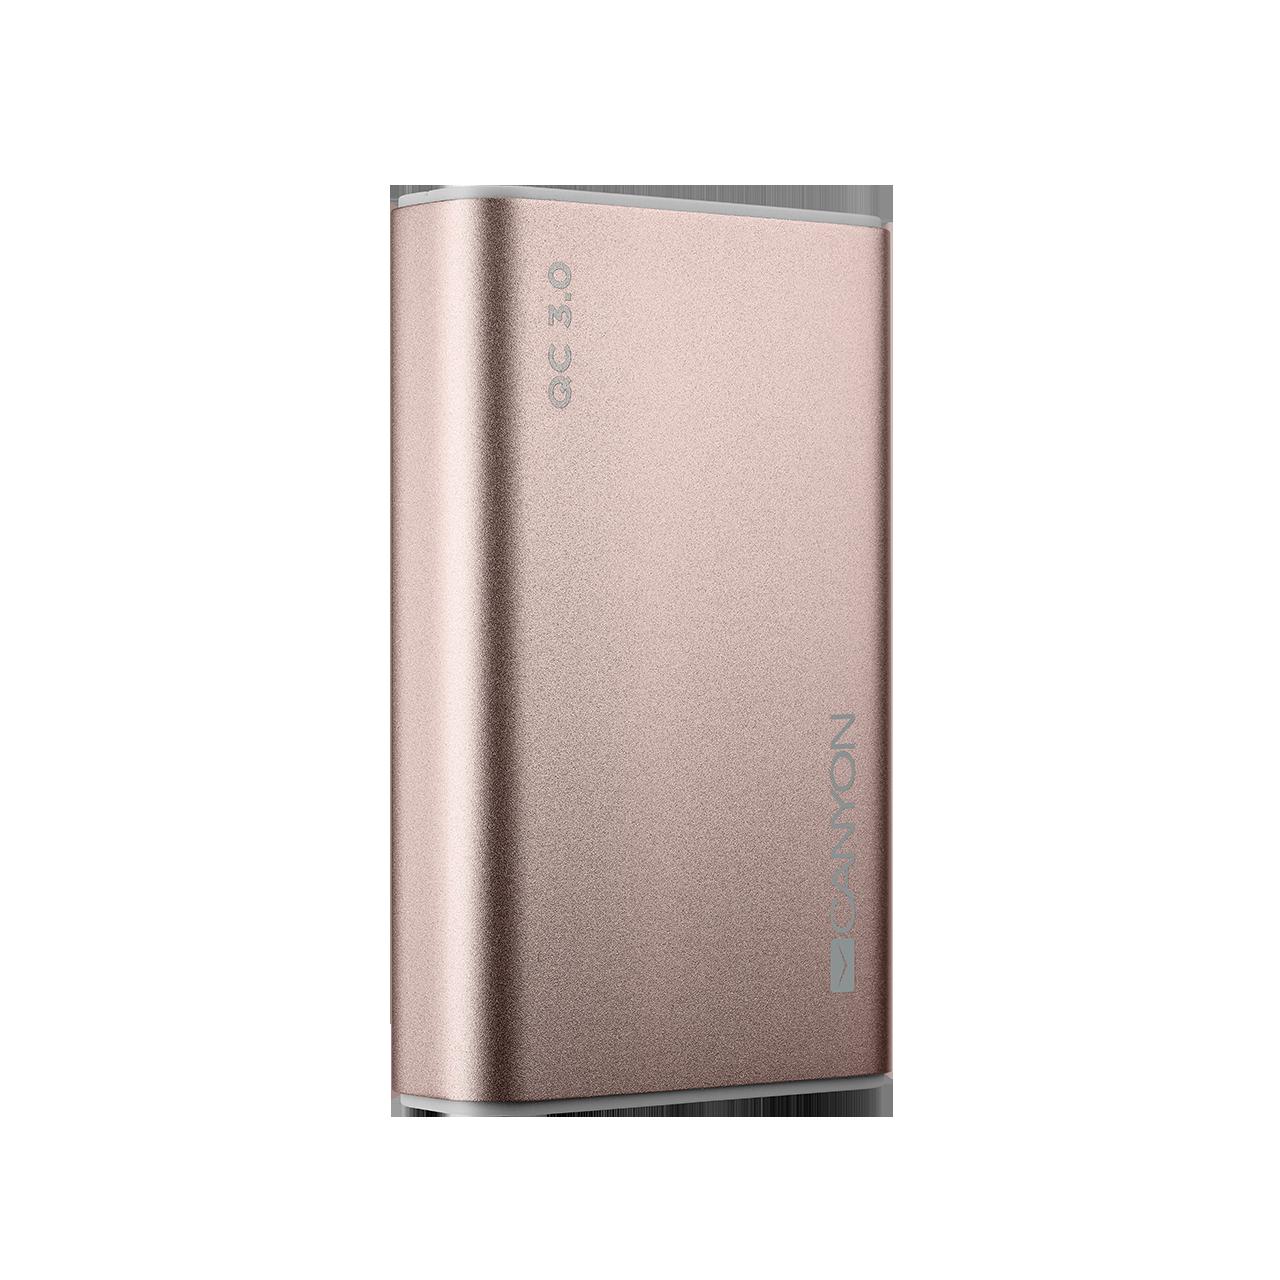 Baterie Externa Canyon CND-TPBQC10RG Quick Charge 3.0 10000mAh Rose Gold